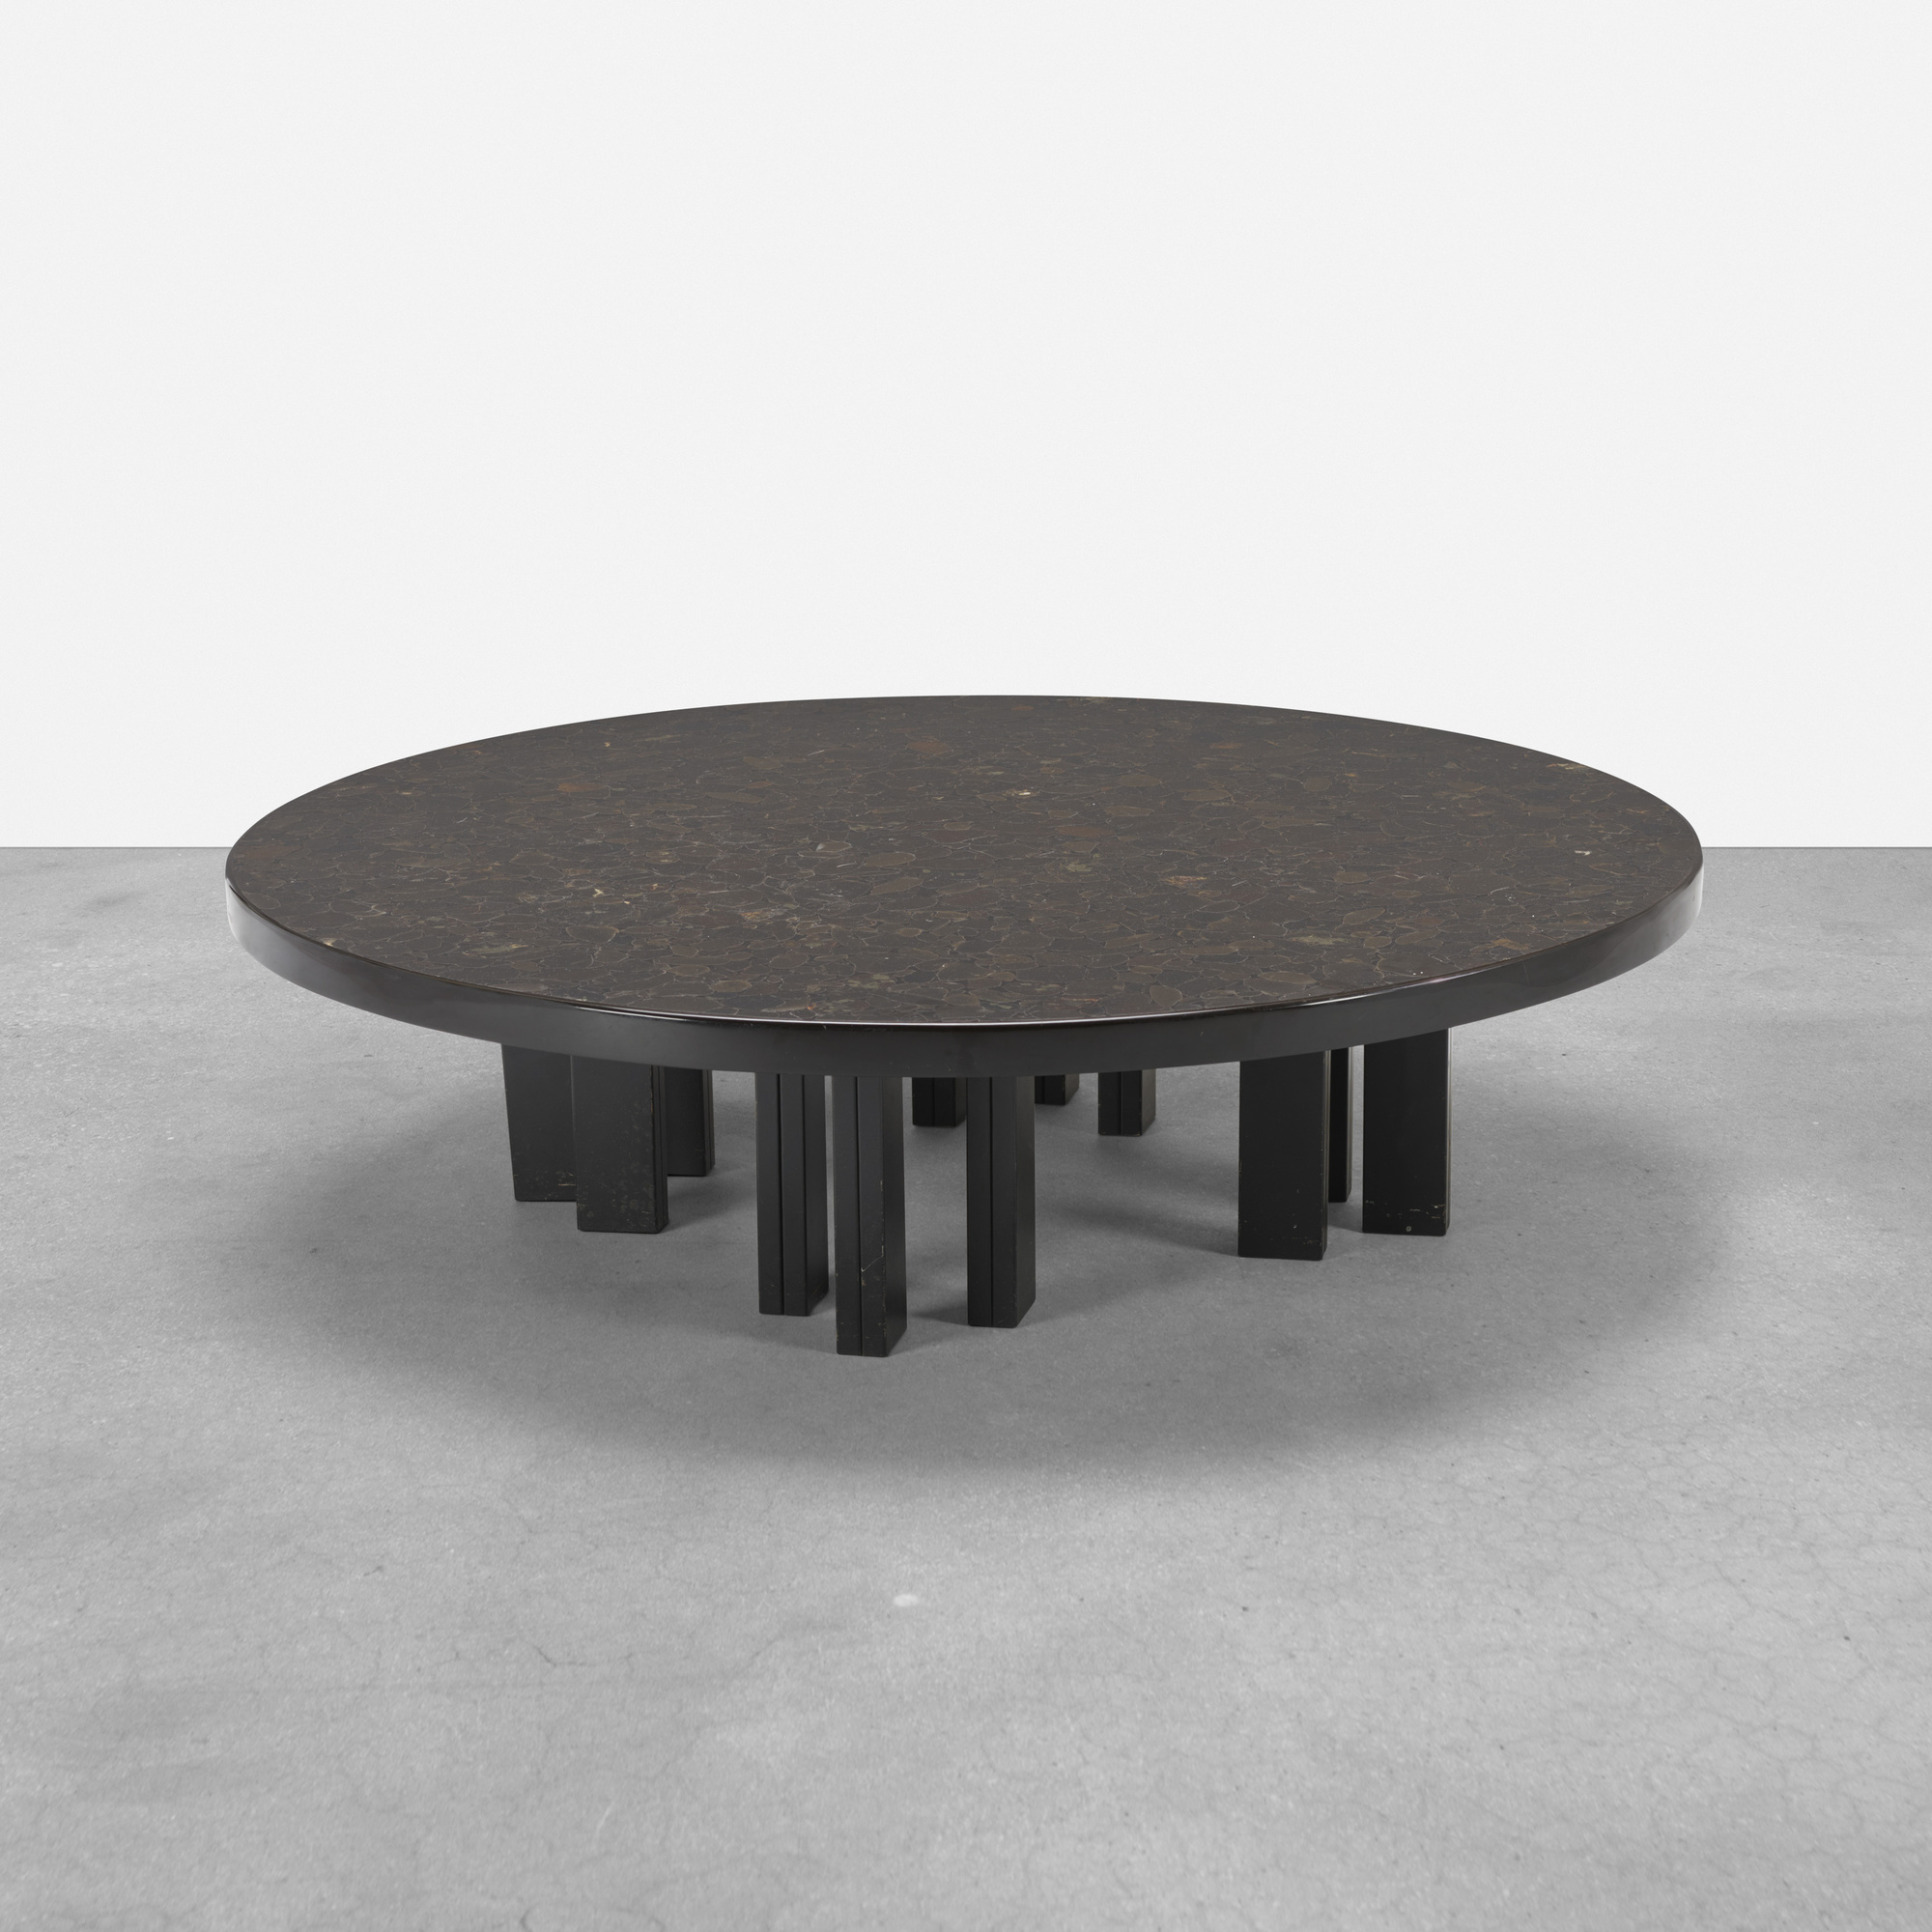 301: Jean Claude Dresse / coffee table (1 of 2)